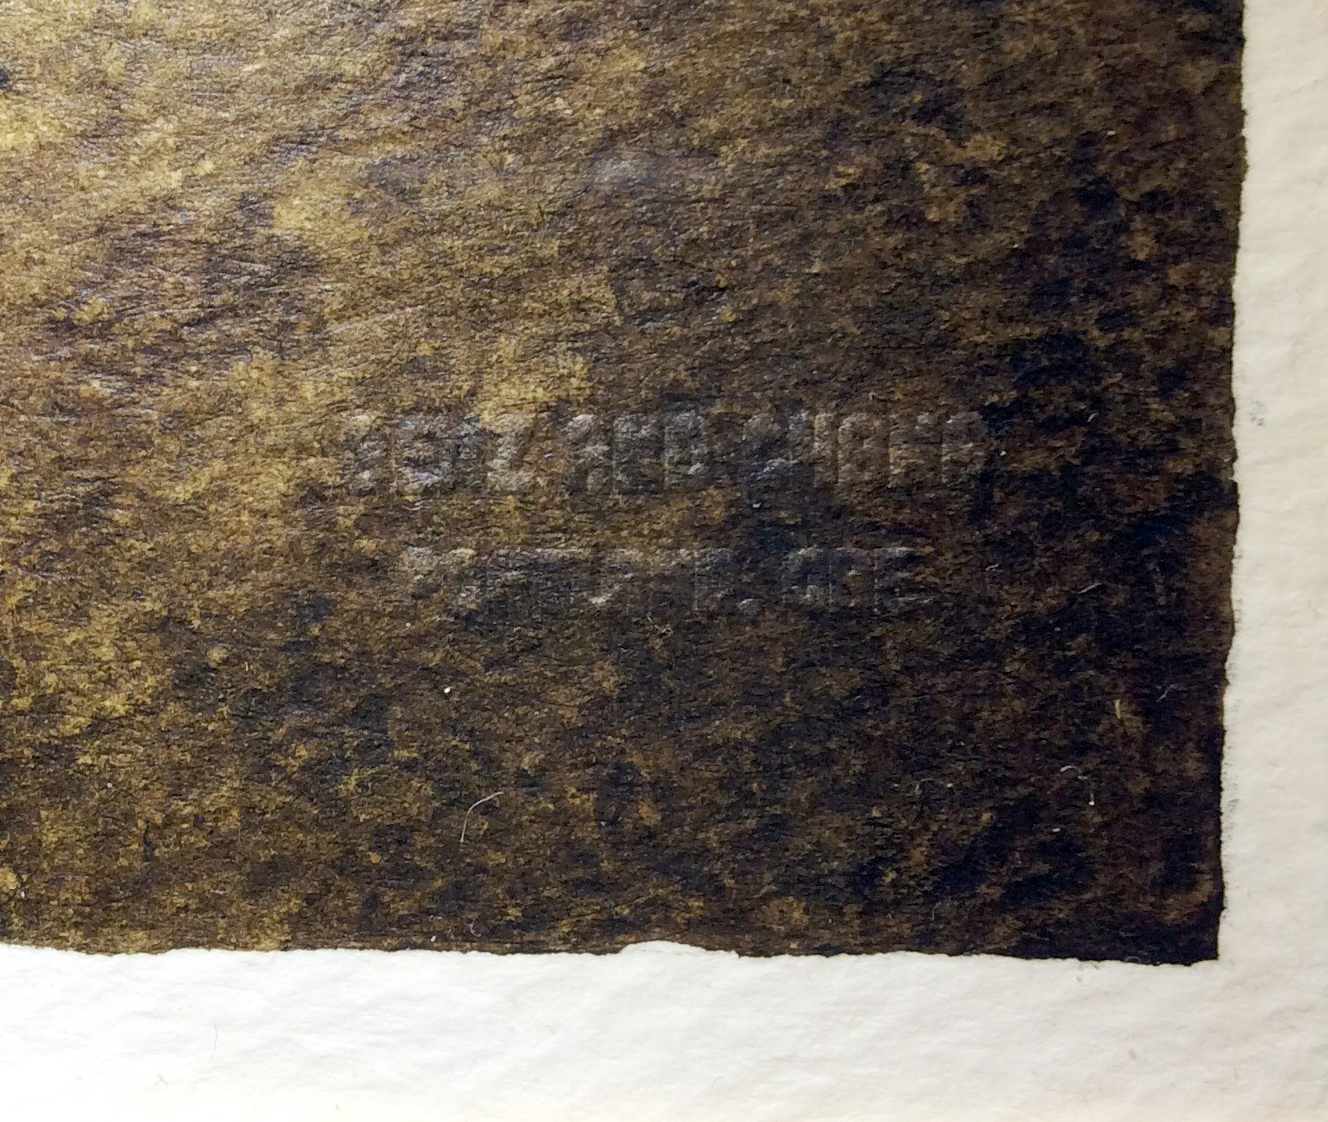 cleopatra-blind-stamp-IMG_3922